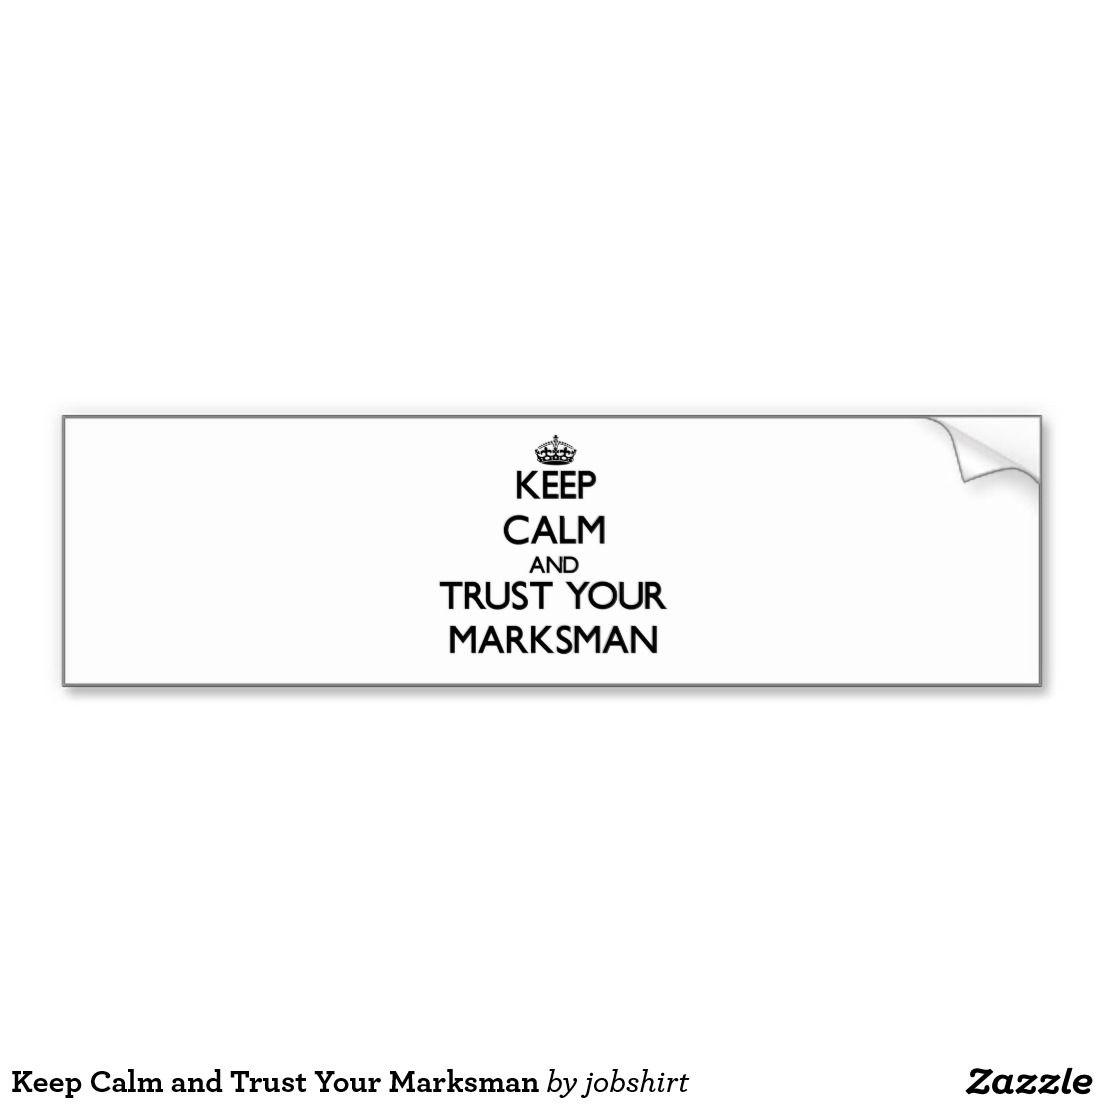 Keep Calm And Trust Your Marksman Bumper Sticker Zazzle Com Bumper Stickers Funny Bumper Stickers Car Bumper Stickers [ 1104 x 1104 Pixel ]